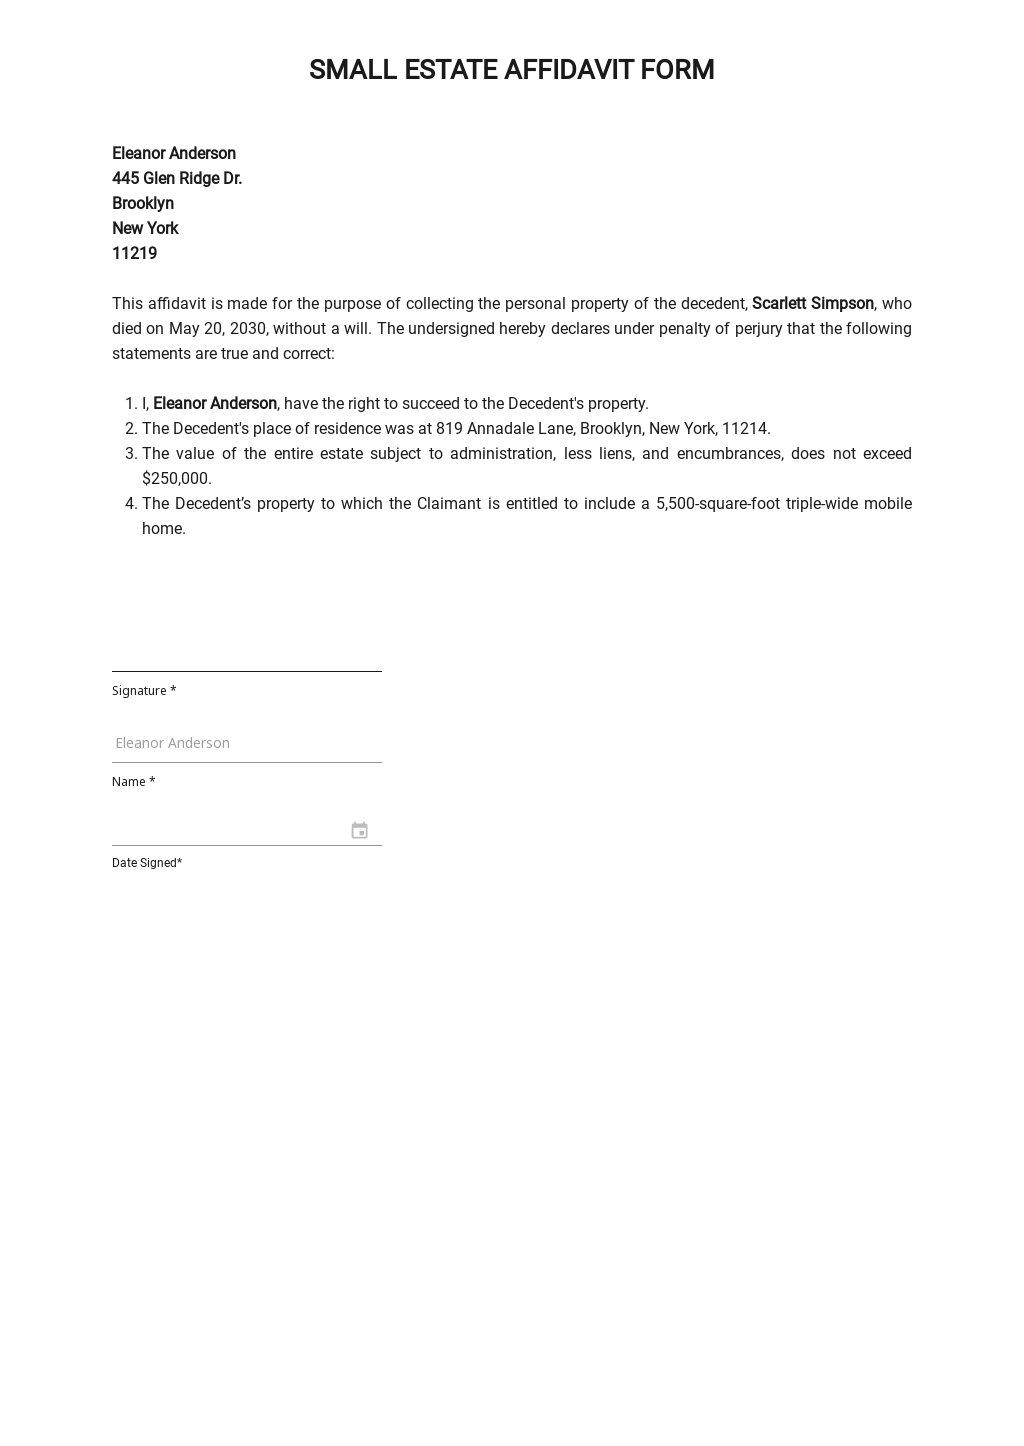 30+ FREE Small Estate Affidavit Templates [Edit & Download ...